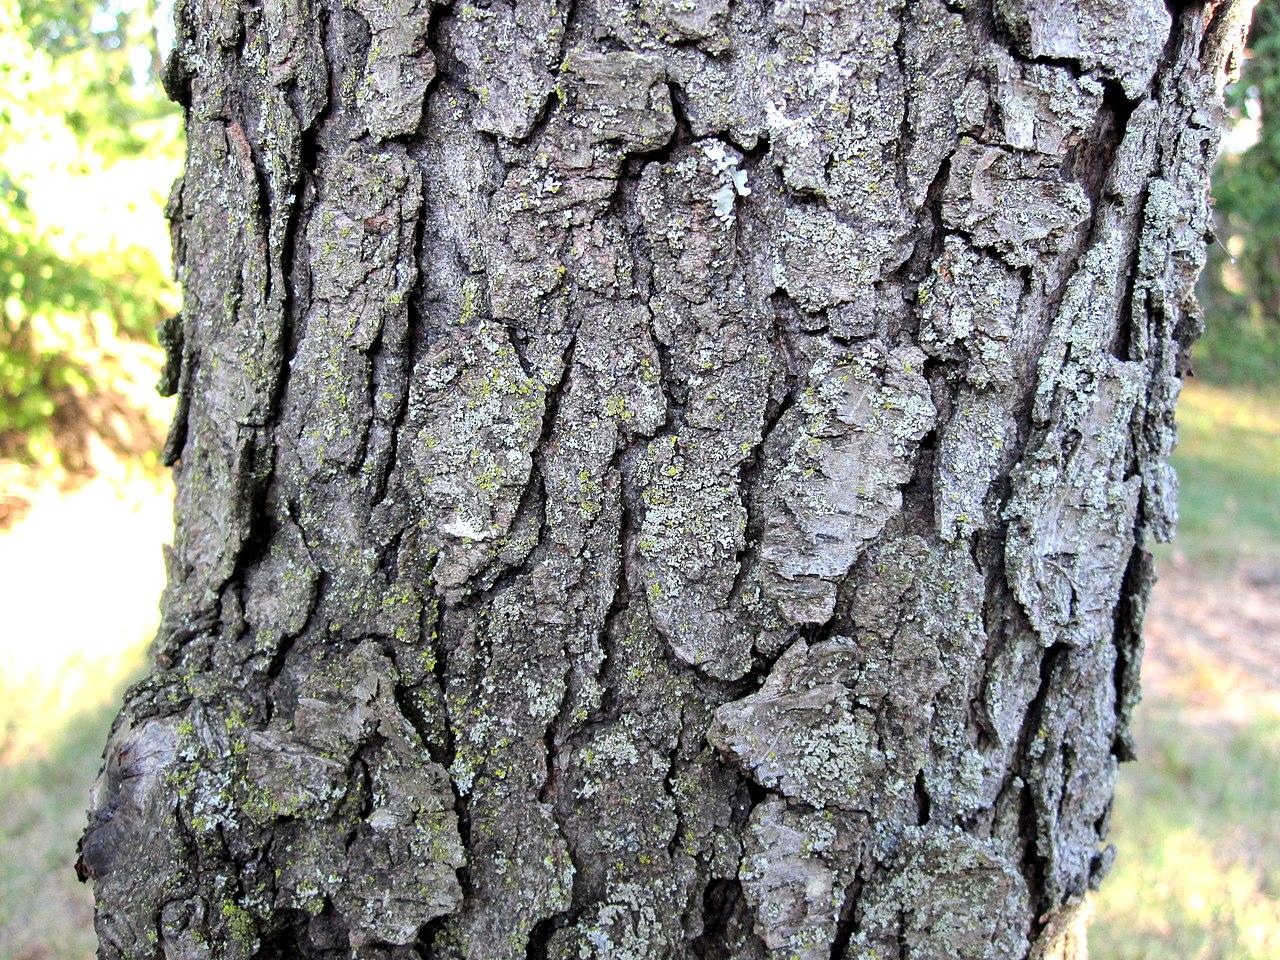 File:Prunus serotina b... What Prunus Serotina Bark Look Like